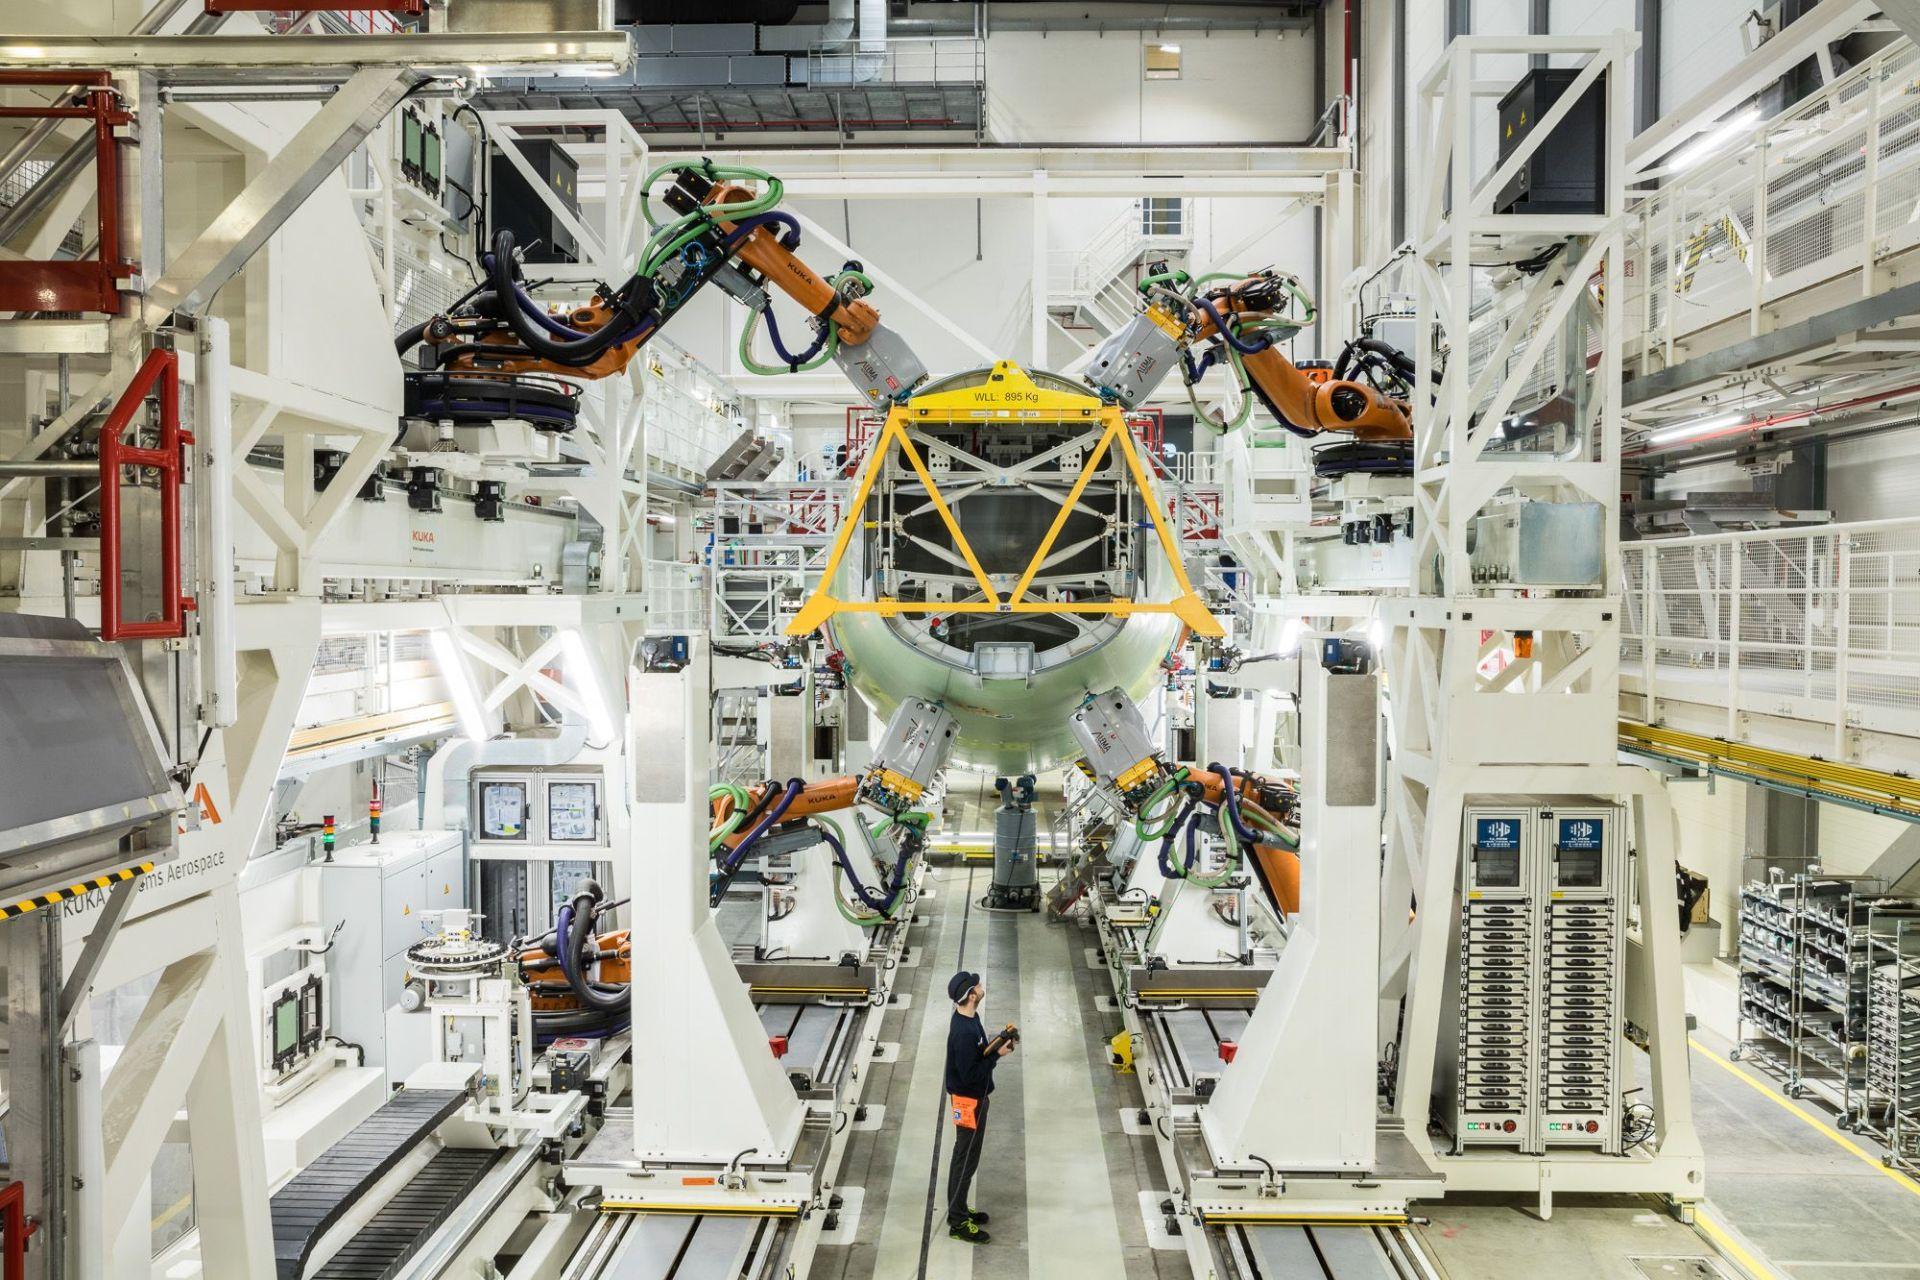 Airbus nedávno uvedl v Hamburku do provozu novou automatizovanou linku pro výrobu A320neo. Foto: Airbus